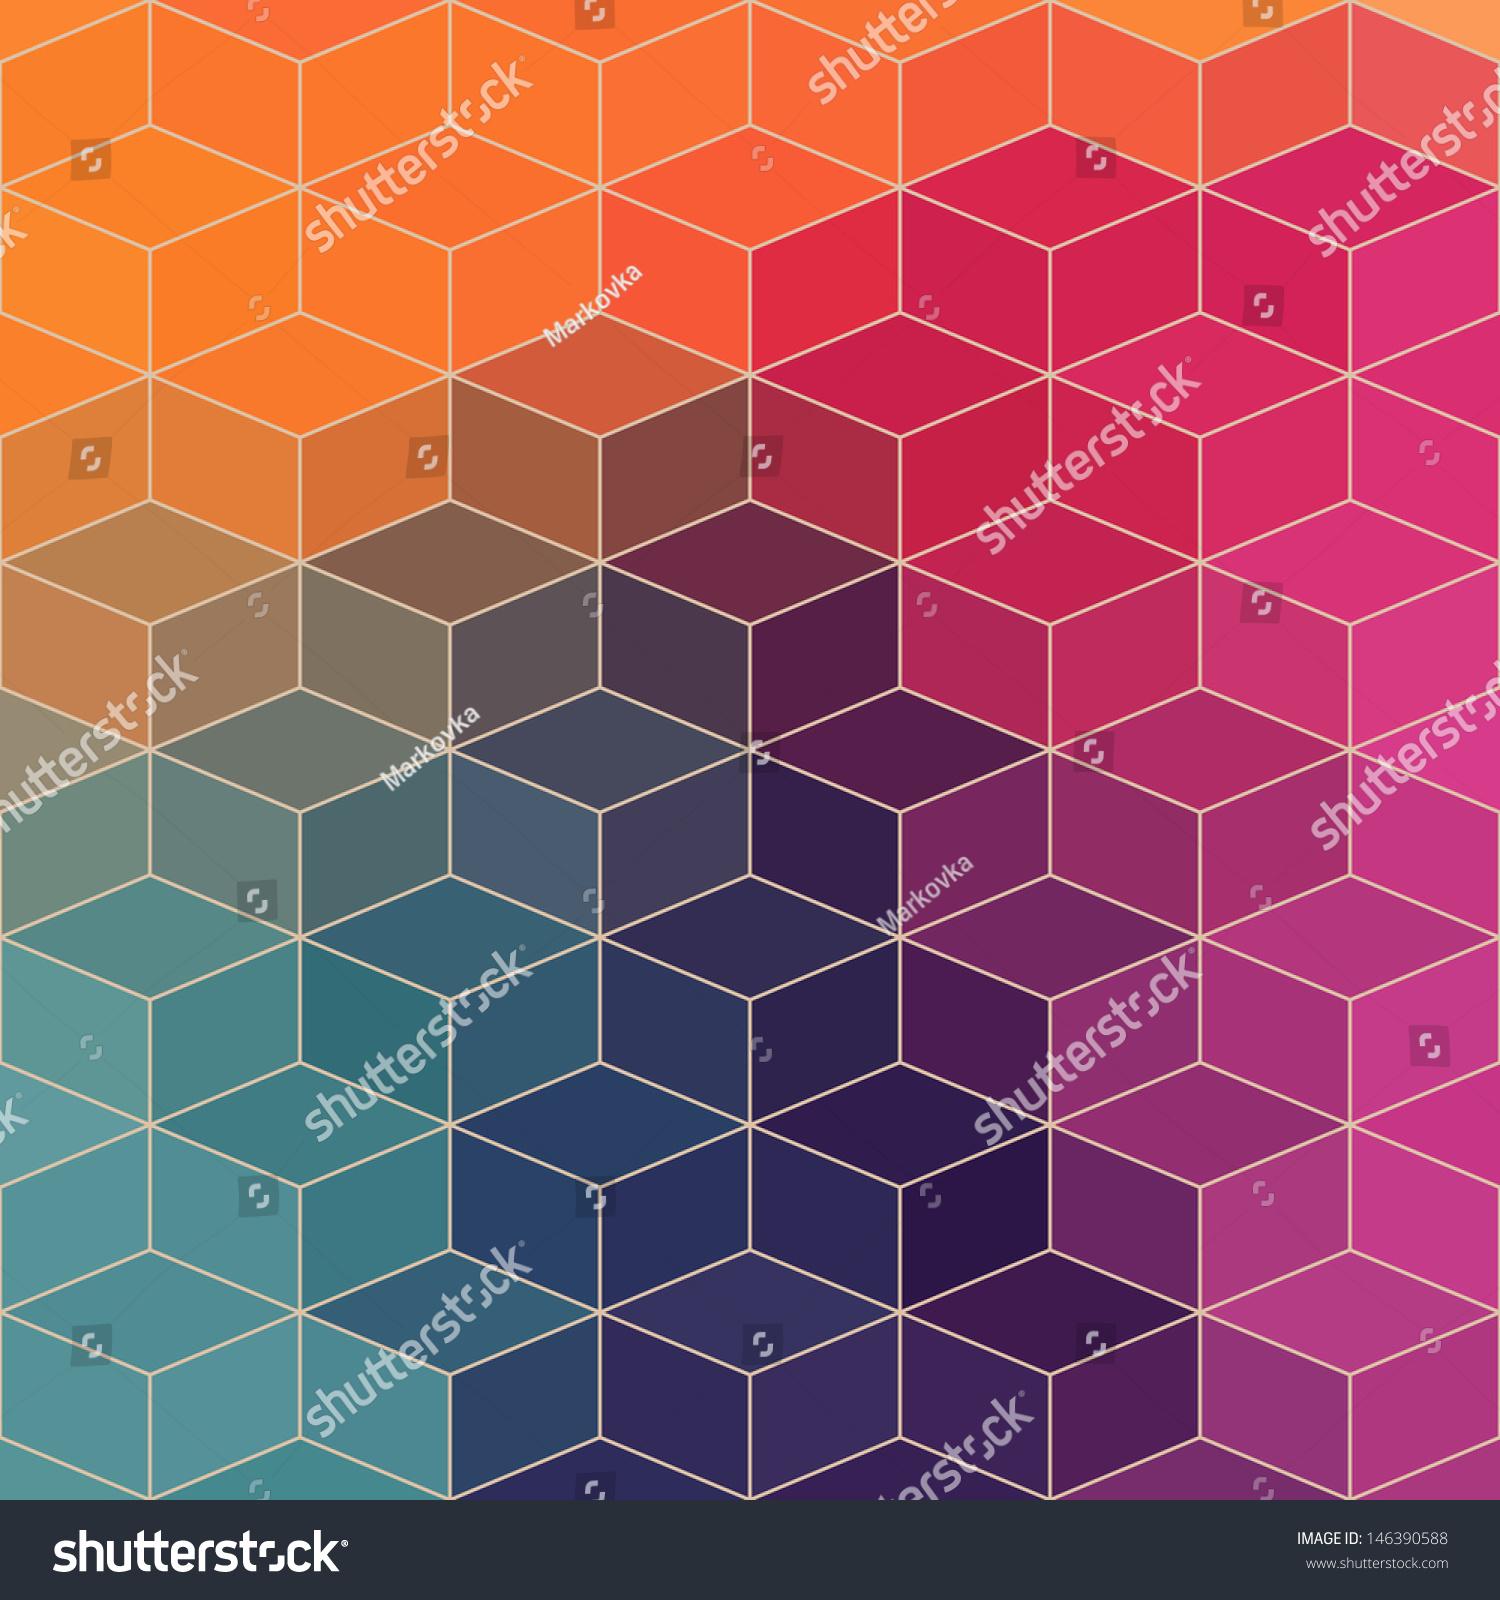 Vector Geometric Pattern Geometric Shapes Rhombus Stock ...